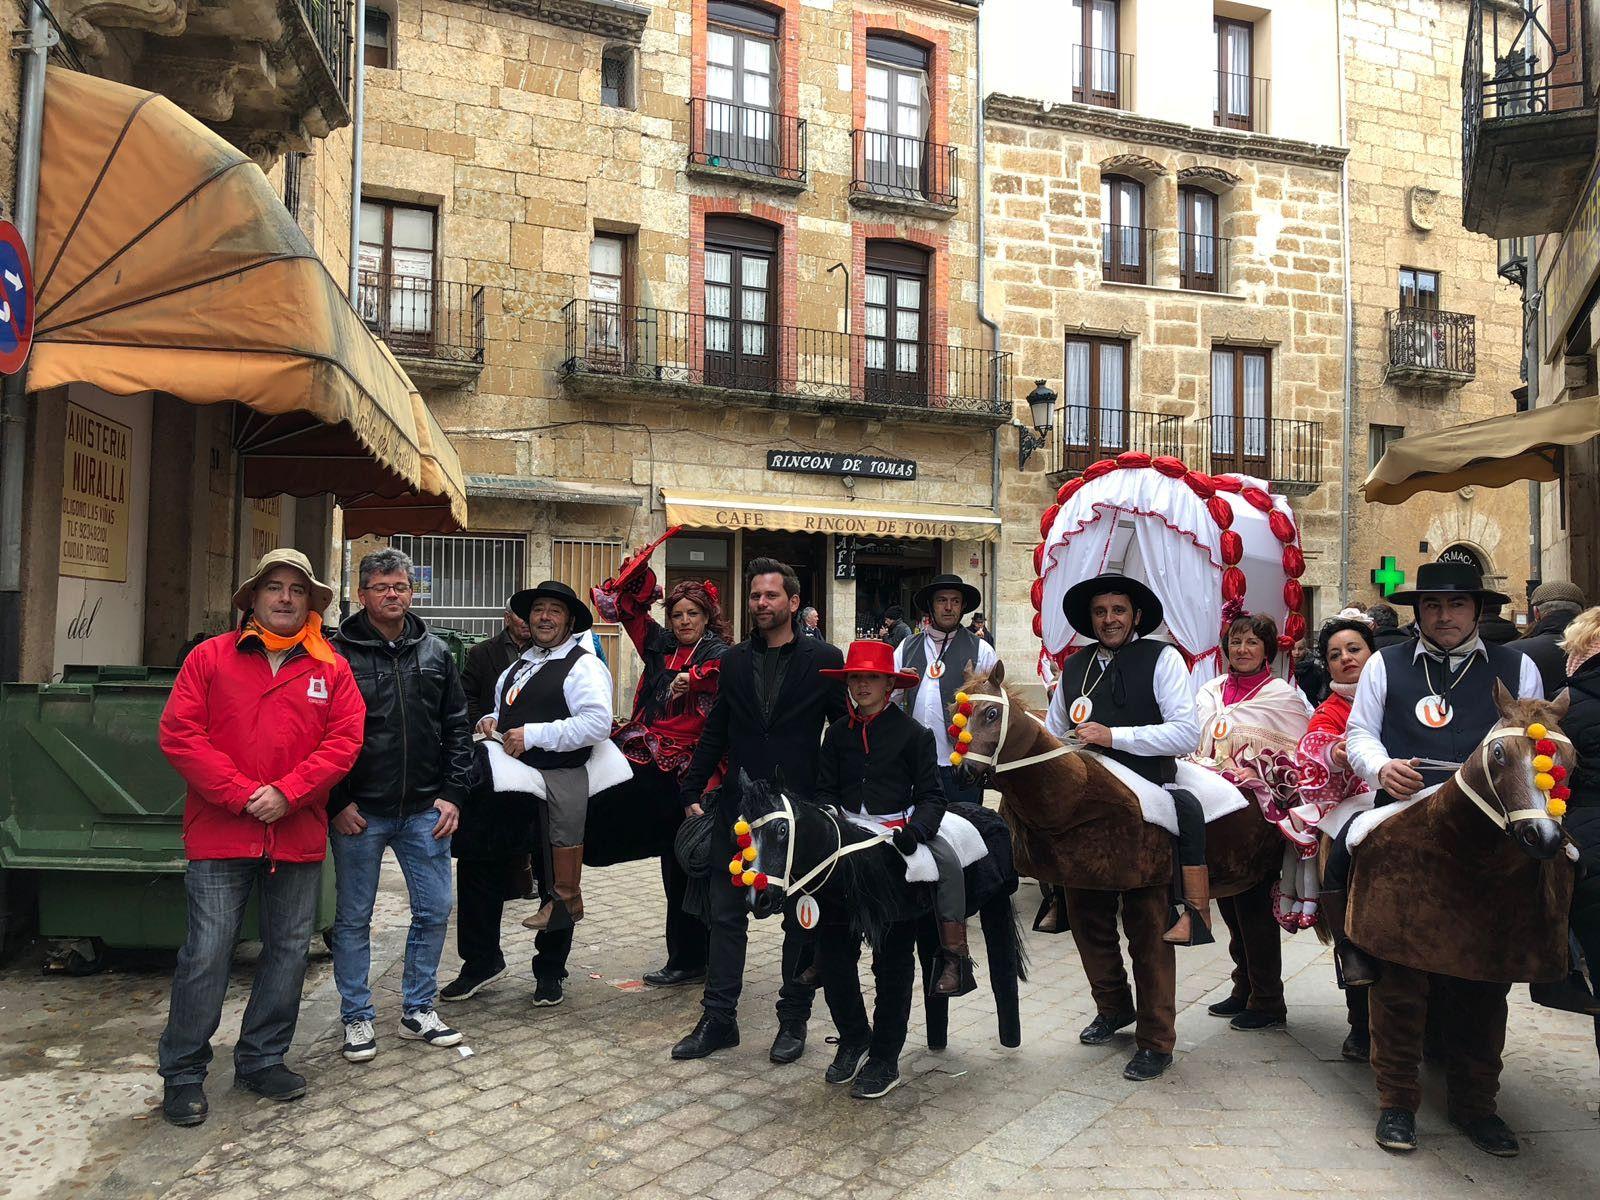 A.Gonzu00e1lez, J.Pellicer y M.Hernu00e1ndez en Carnaval del Toro II 13 2 18